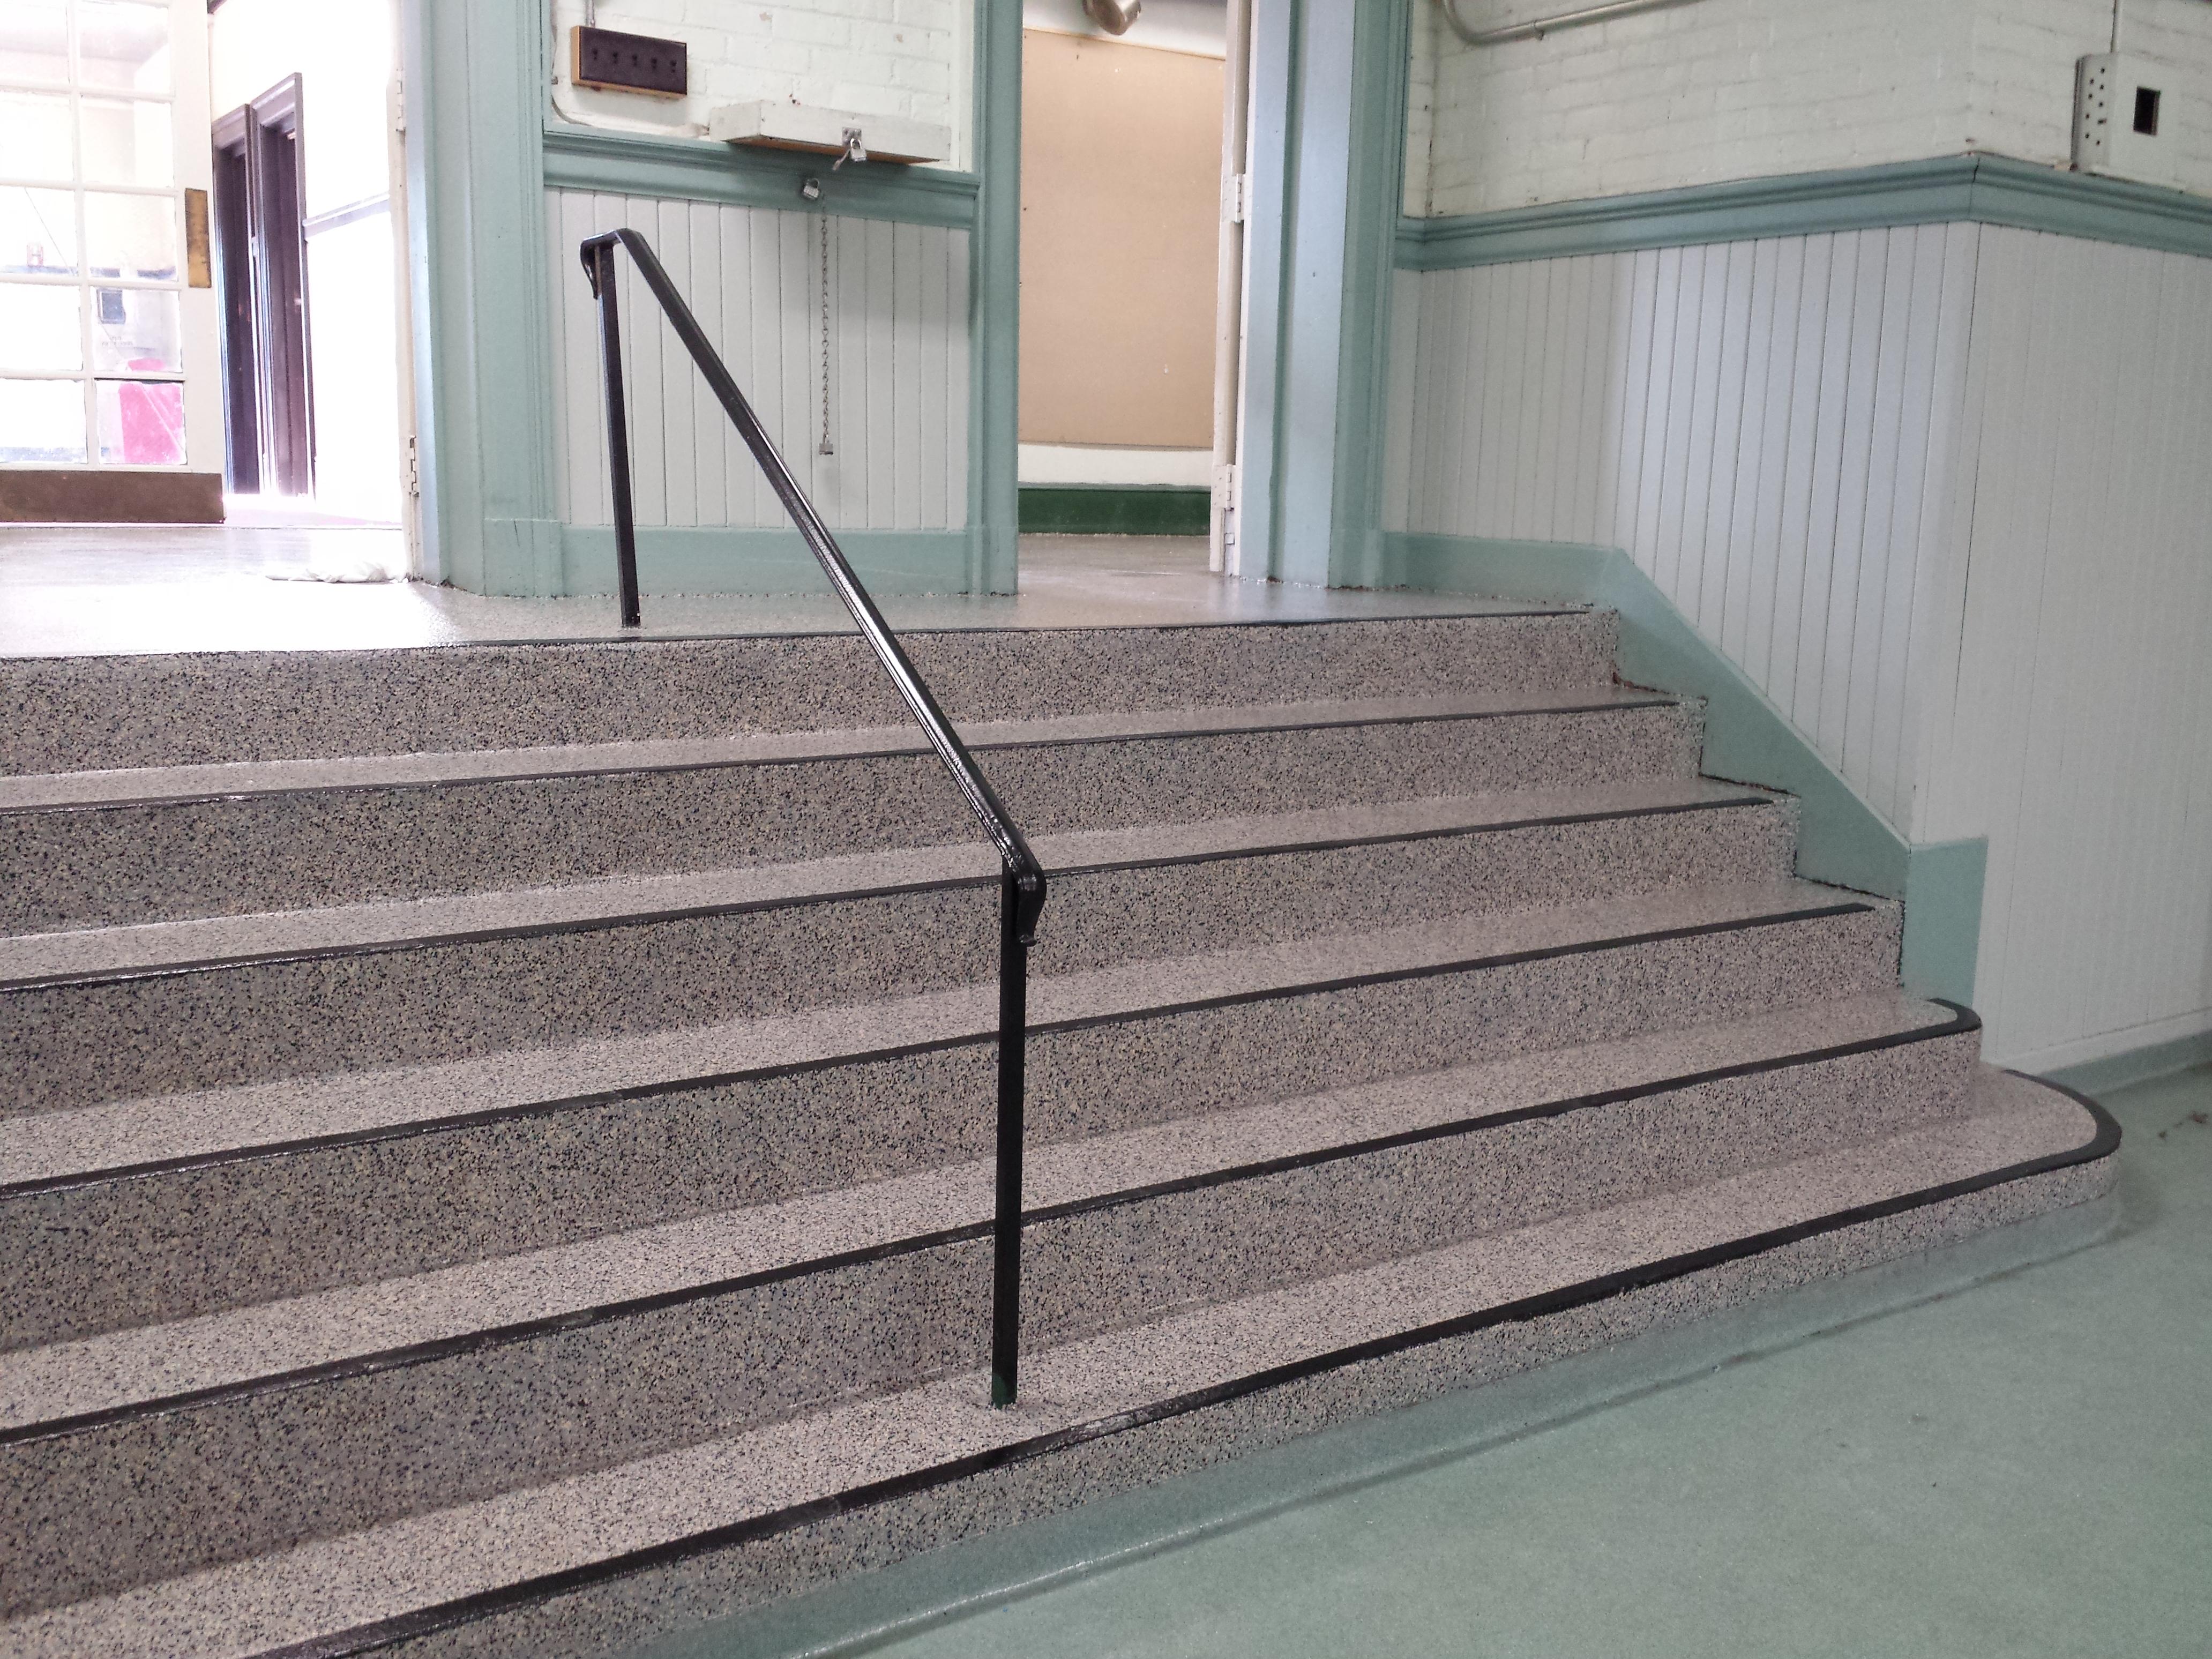 Industrial non slip flooring solutions black bear coatings concrete non slip flooring solutions dailygadgetfo Gallery